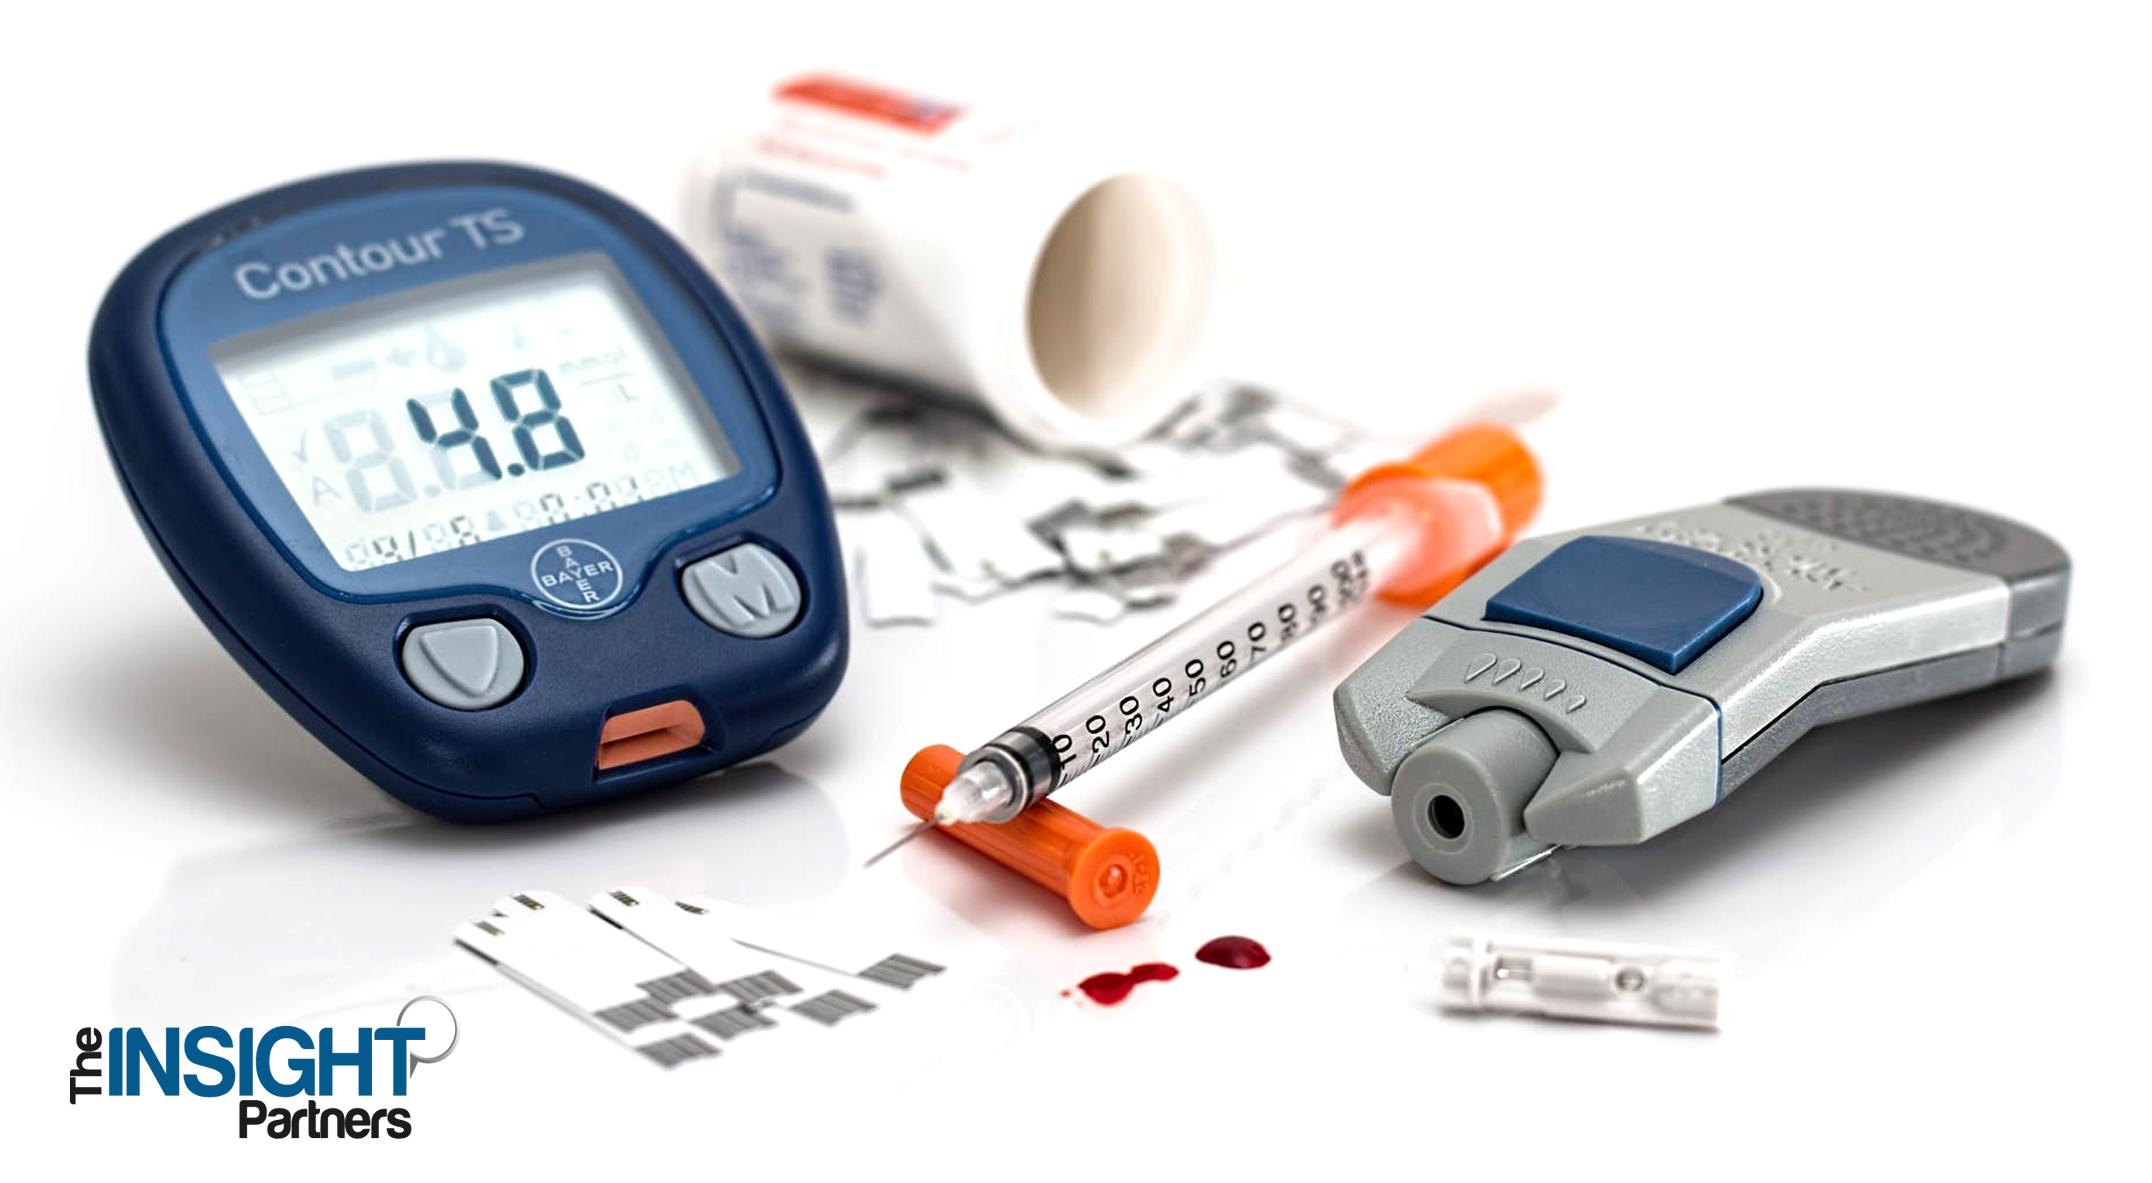 Multiple Sclerosis Market Size Growth Forecasts to 2027 - Sanofi, Teva Pharmaceutical, Bayer, Pfizer, Synthetic Biologic